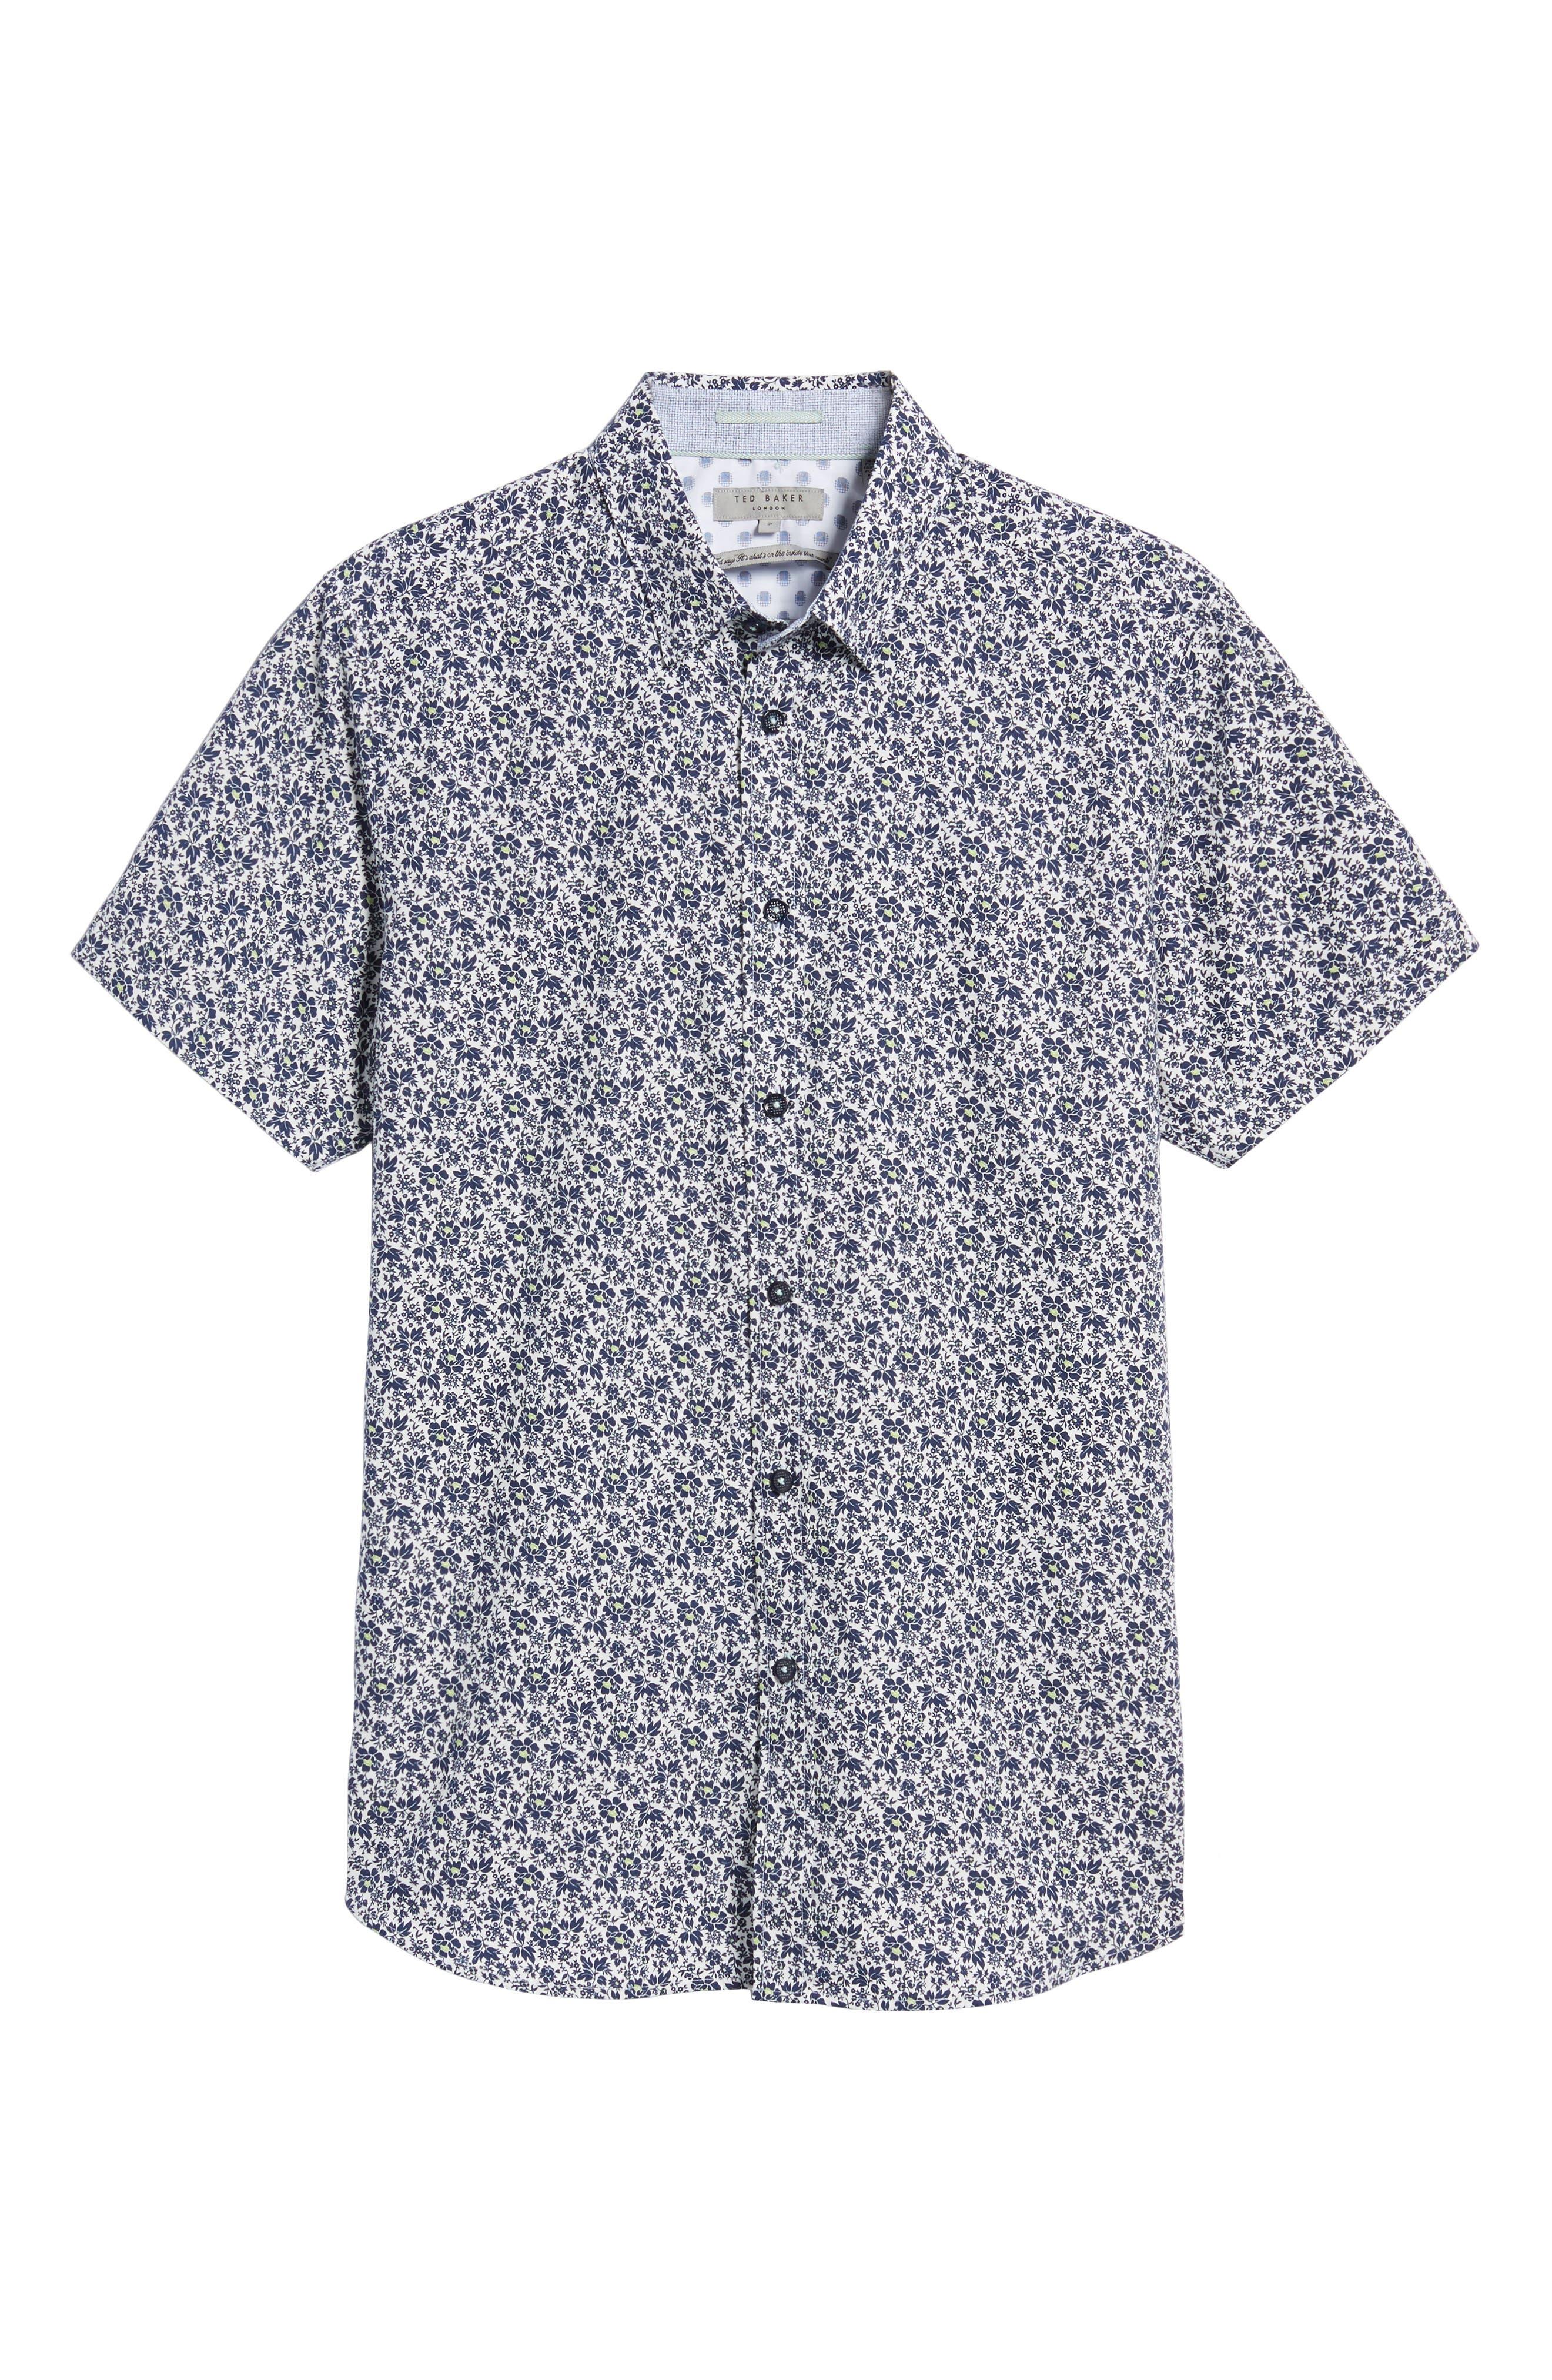 Alygar Slim Fit Floral Woven Shirt,                             Alternate thumbnail 6, color,                             402